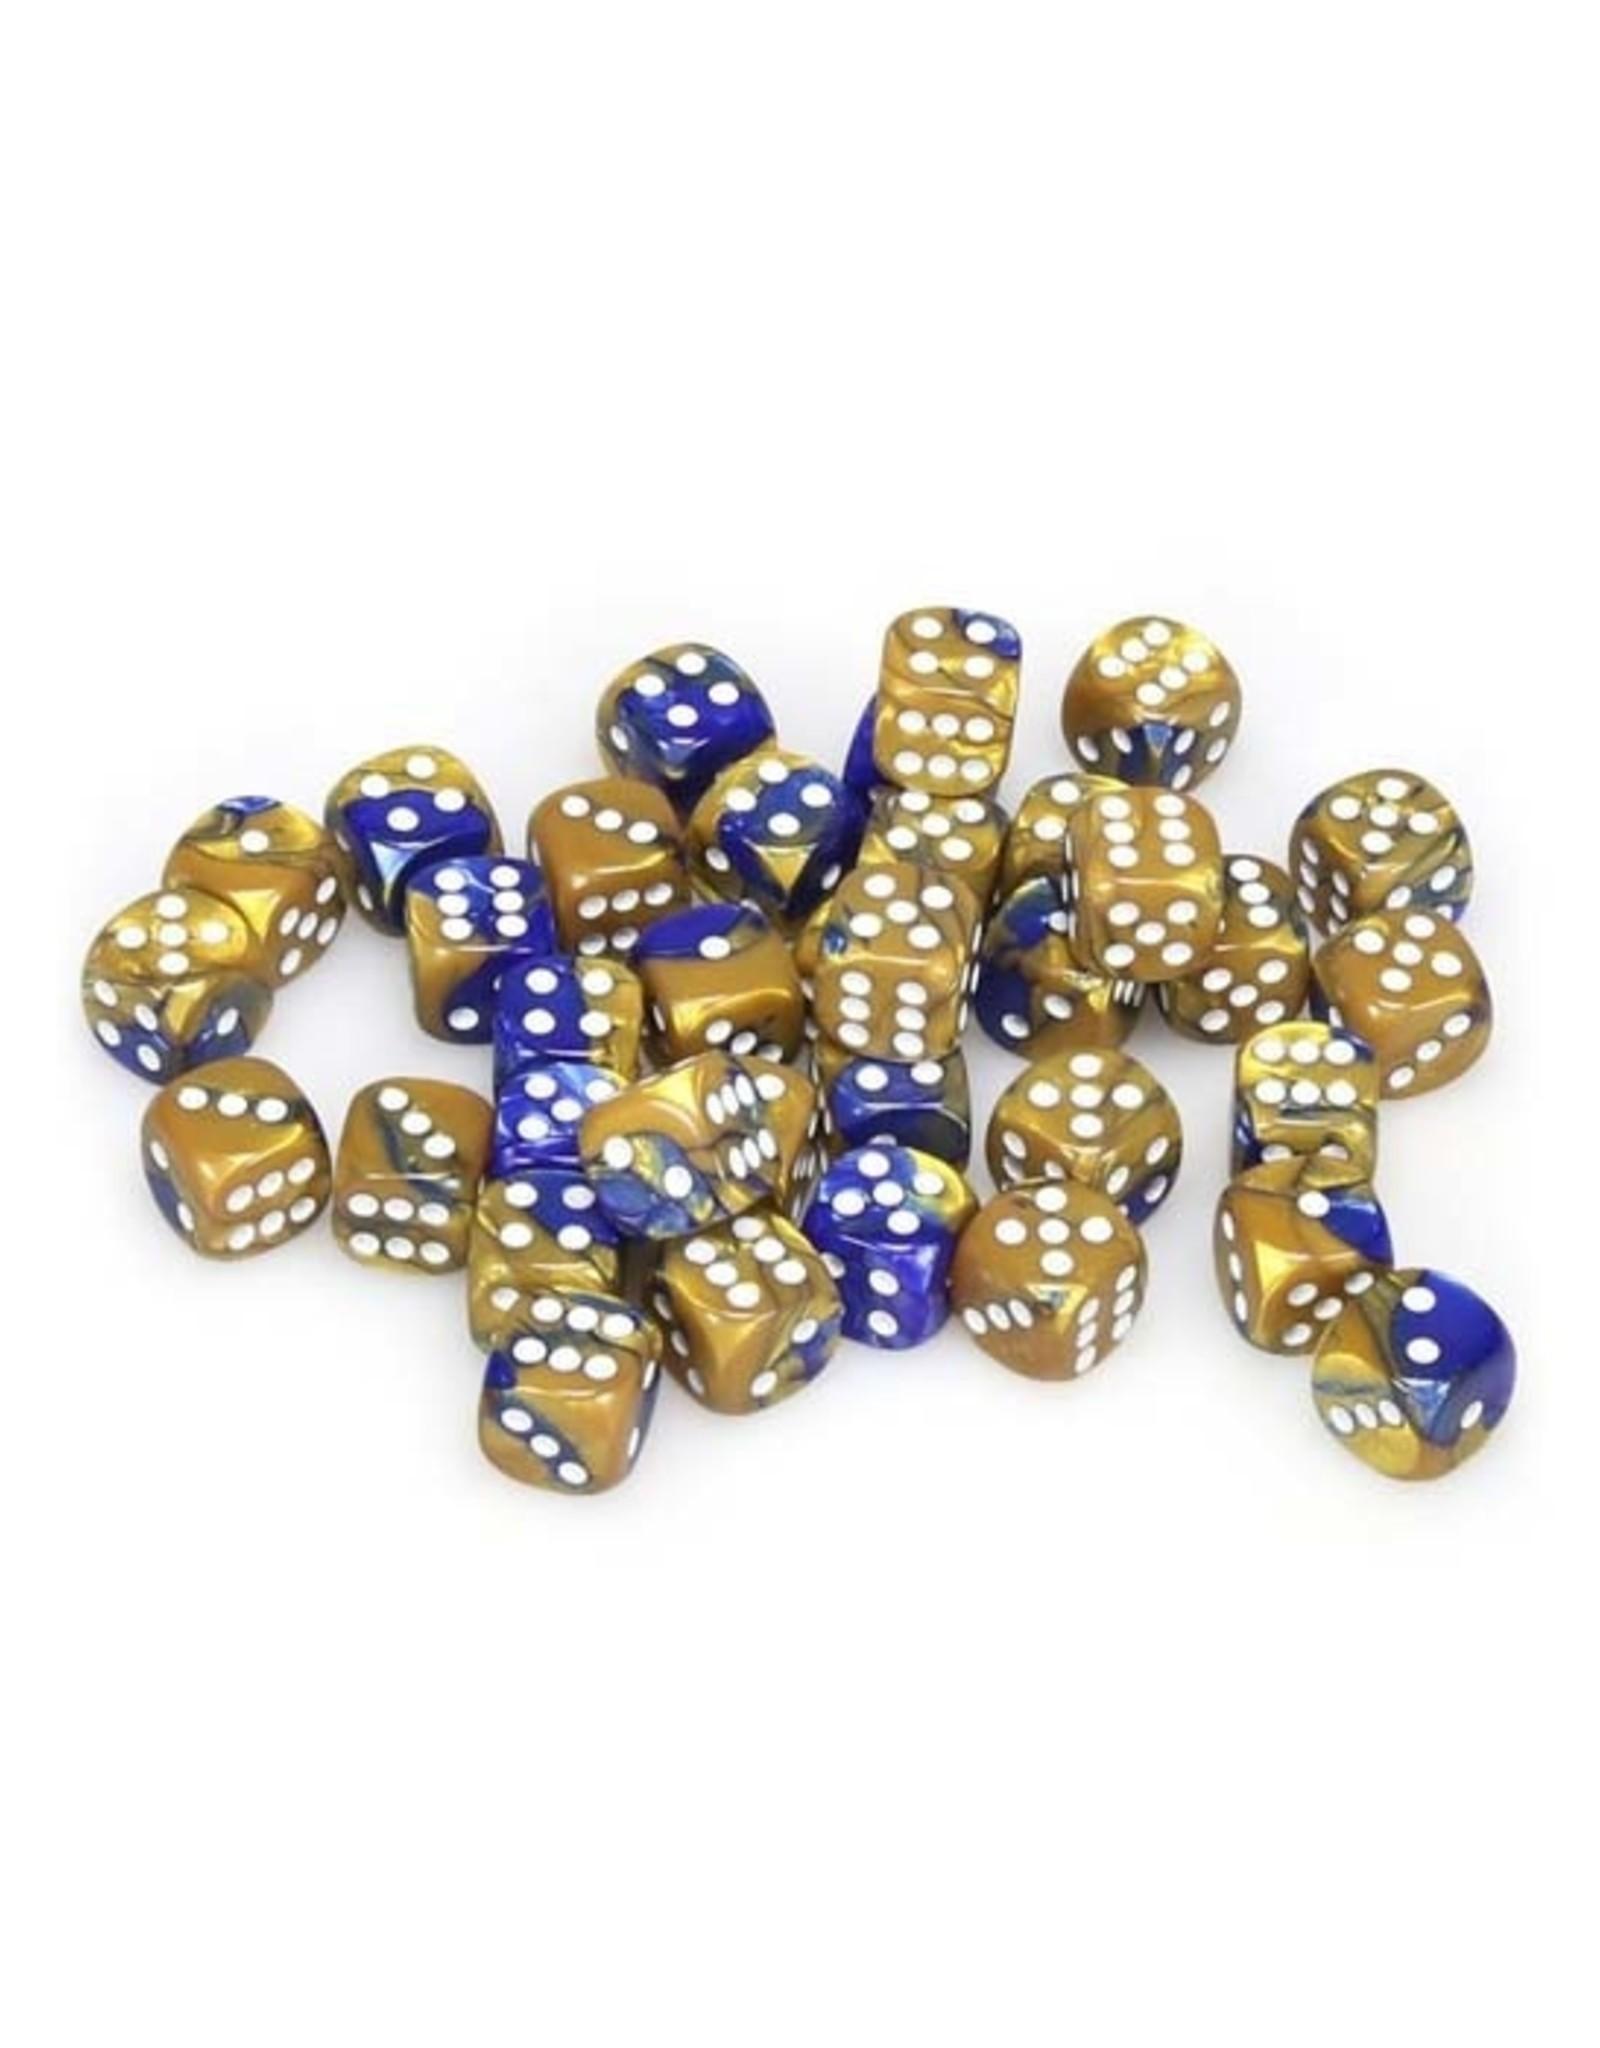 Chessex Chessex: 12mm D6 - Gemini - Blue-Gold w/ White